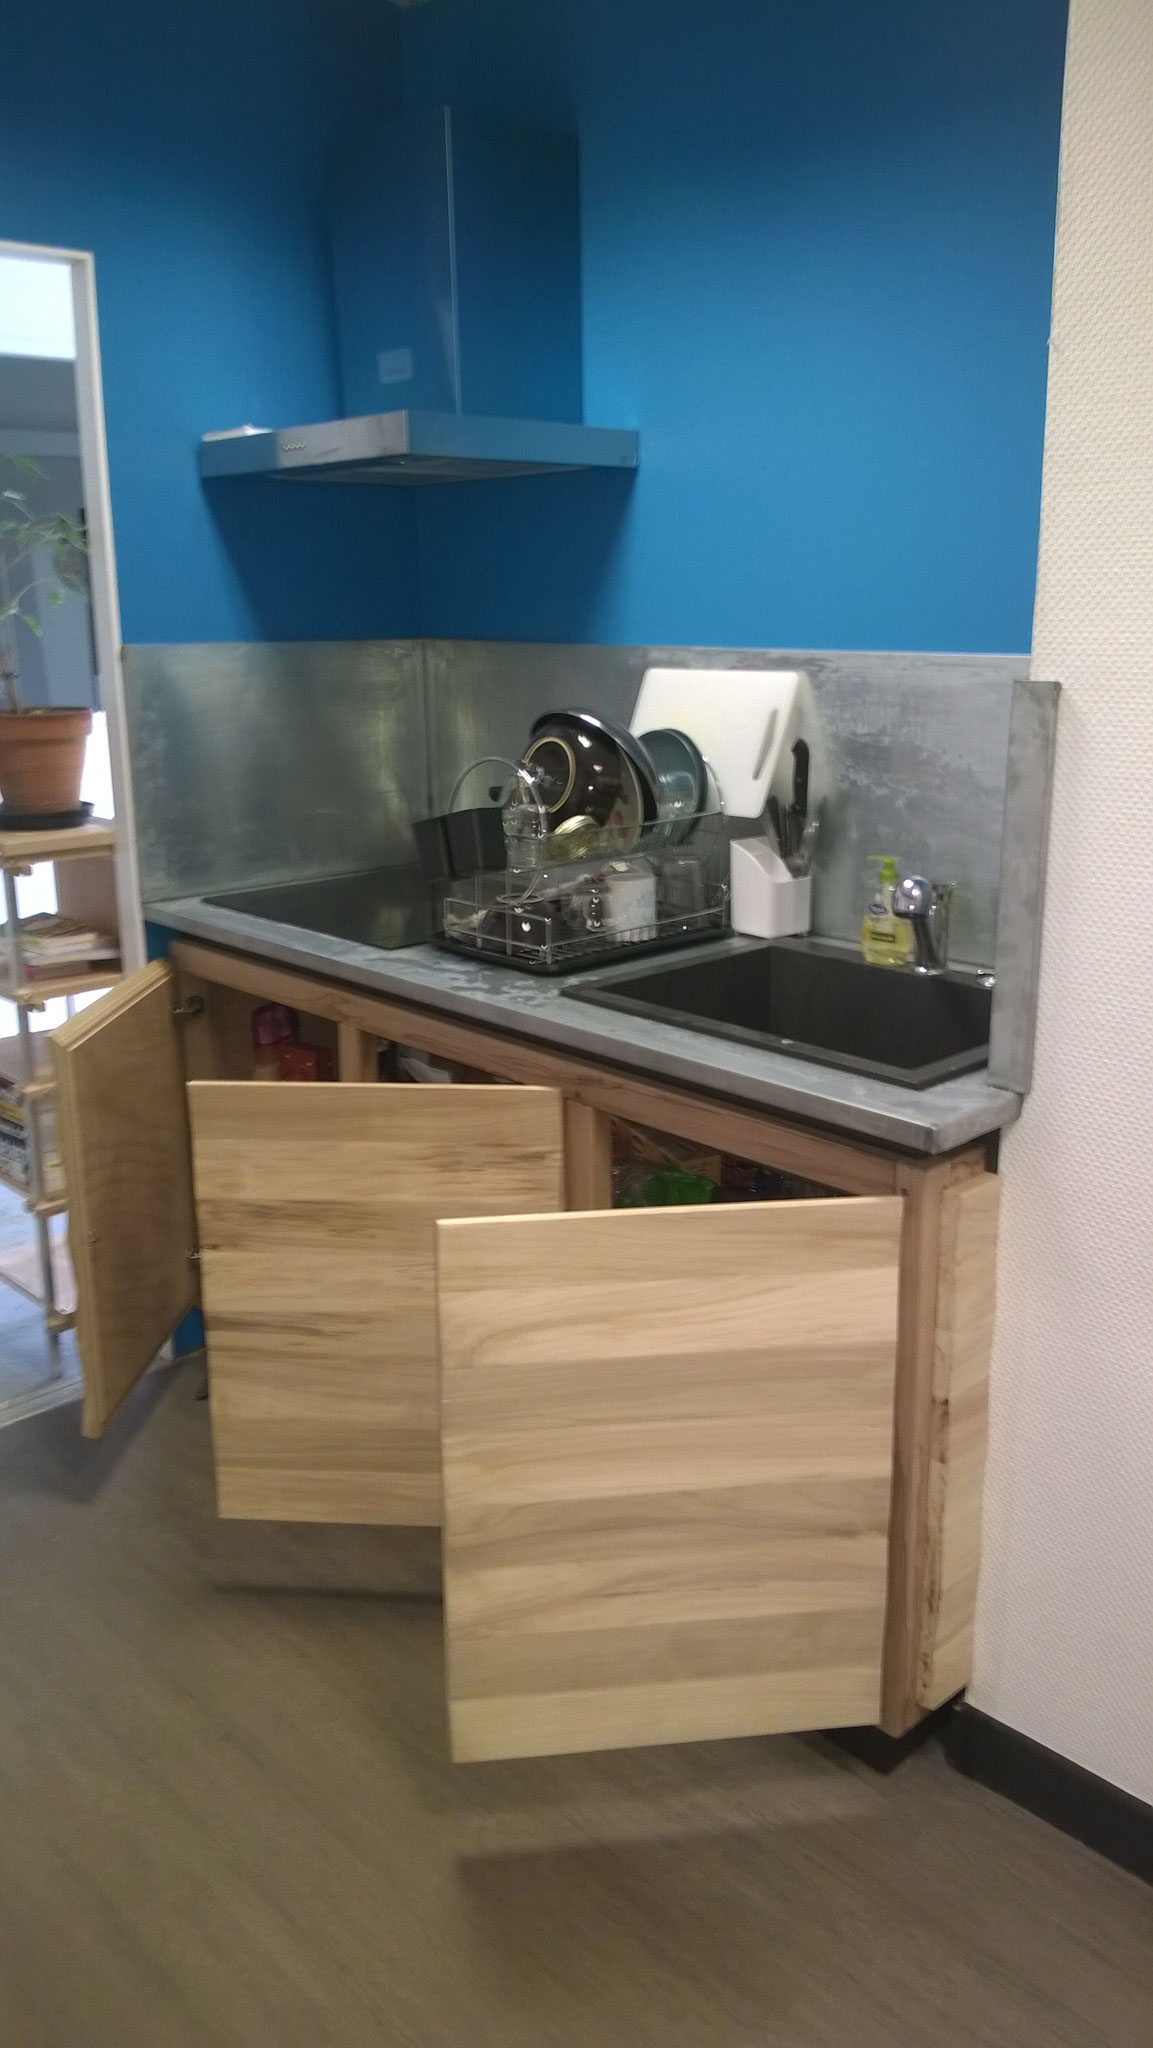 Meuble cuisine design bois, zinc